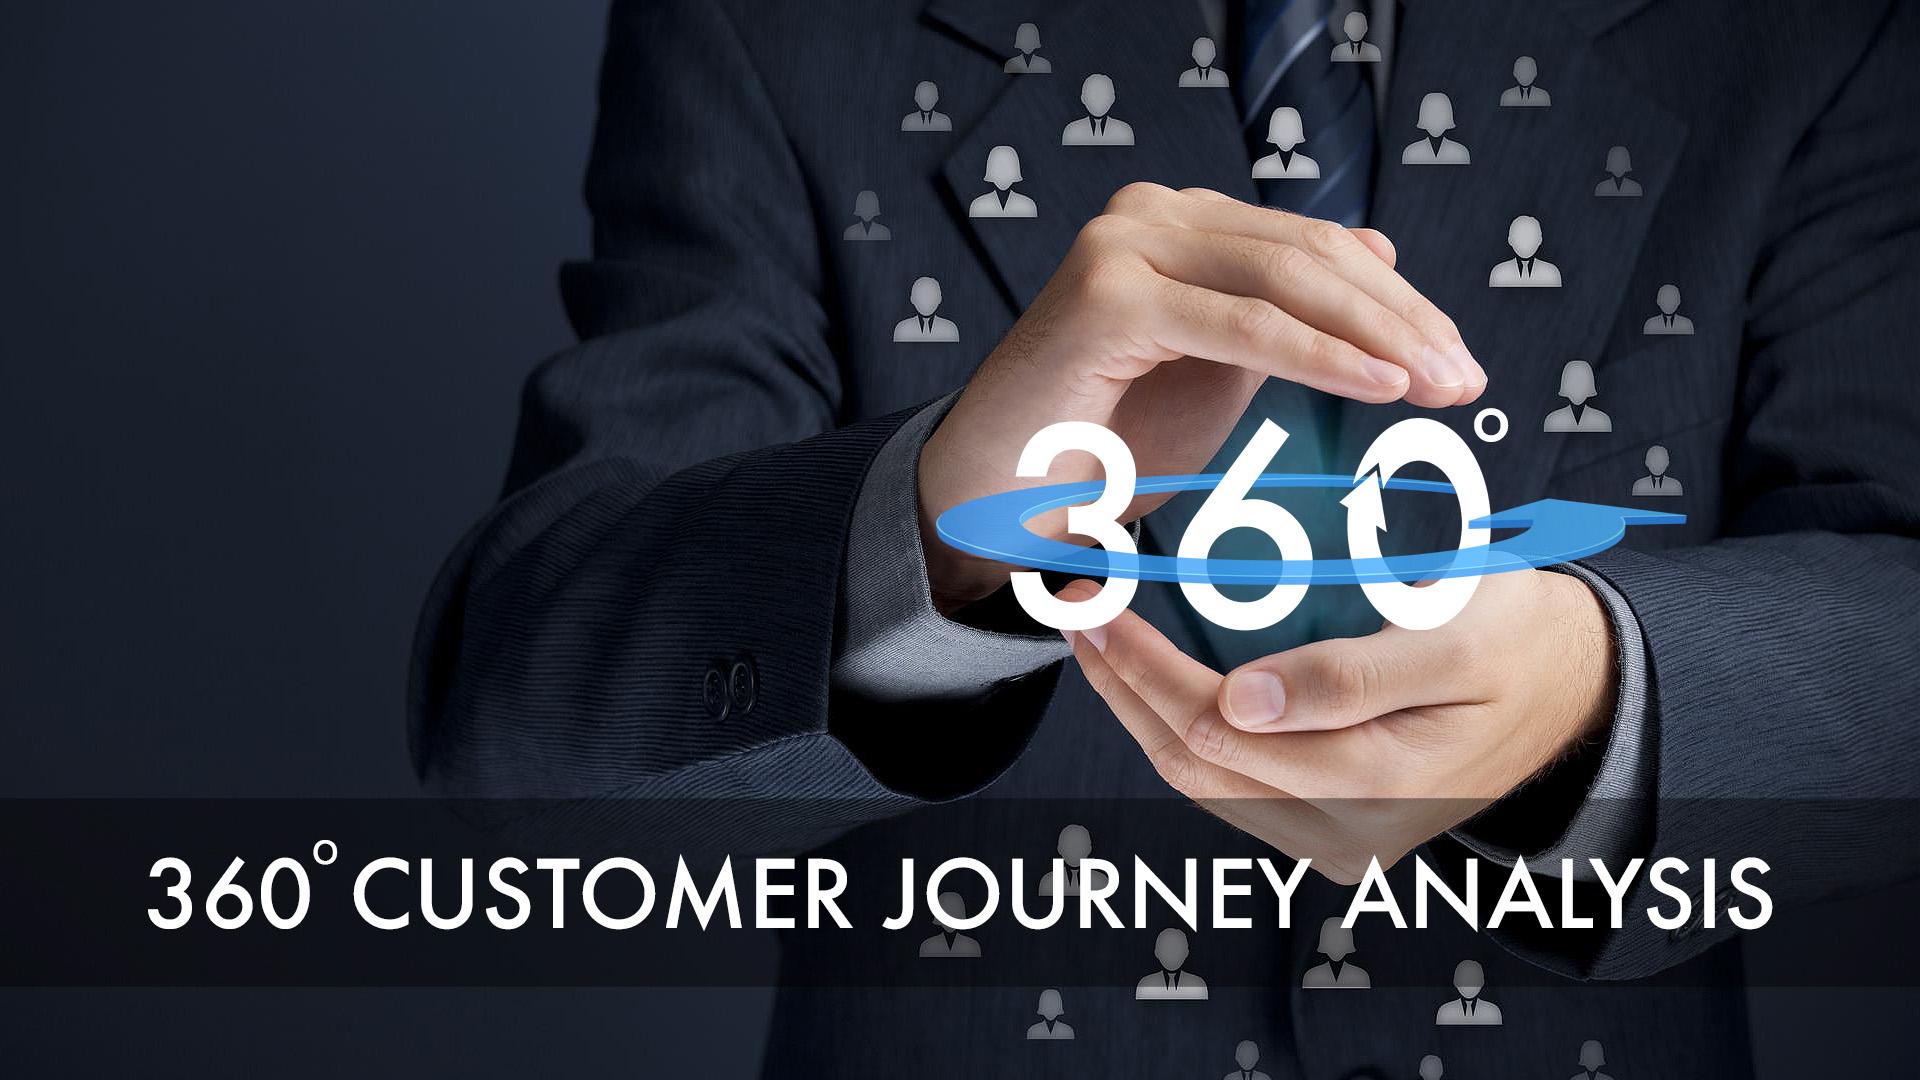 Customer Journey Analysis Thumbnail.jpg